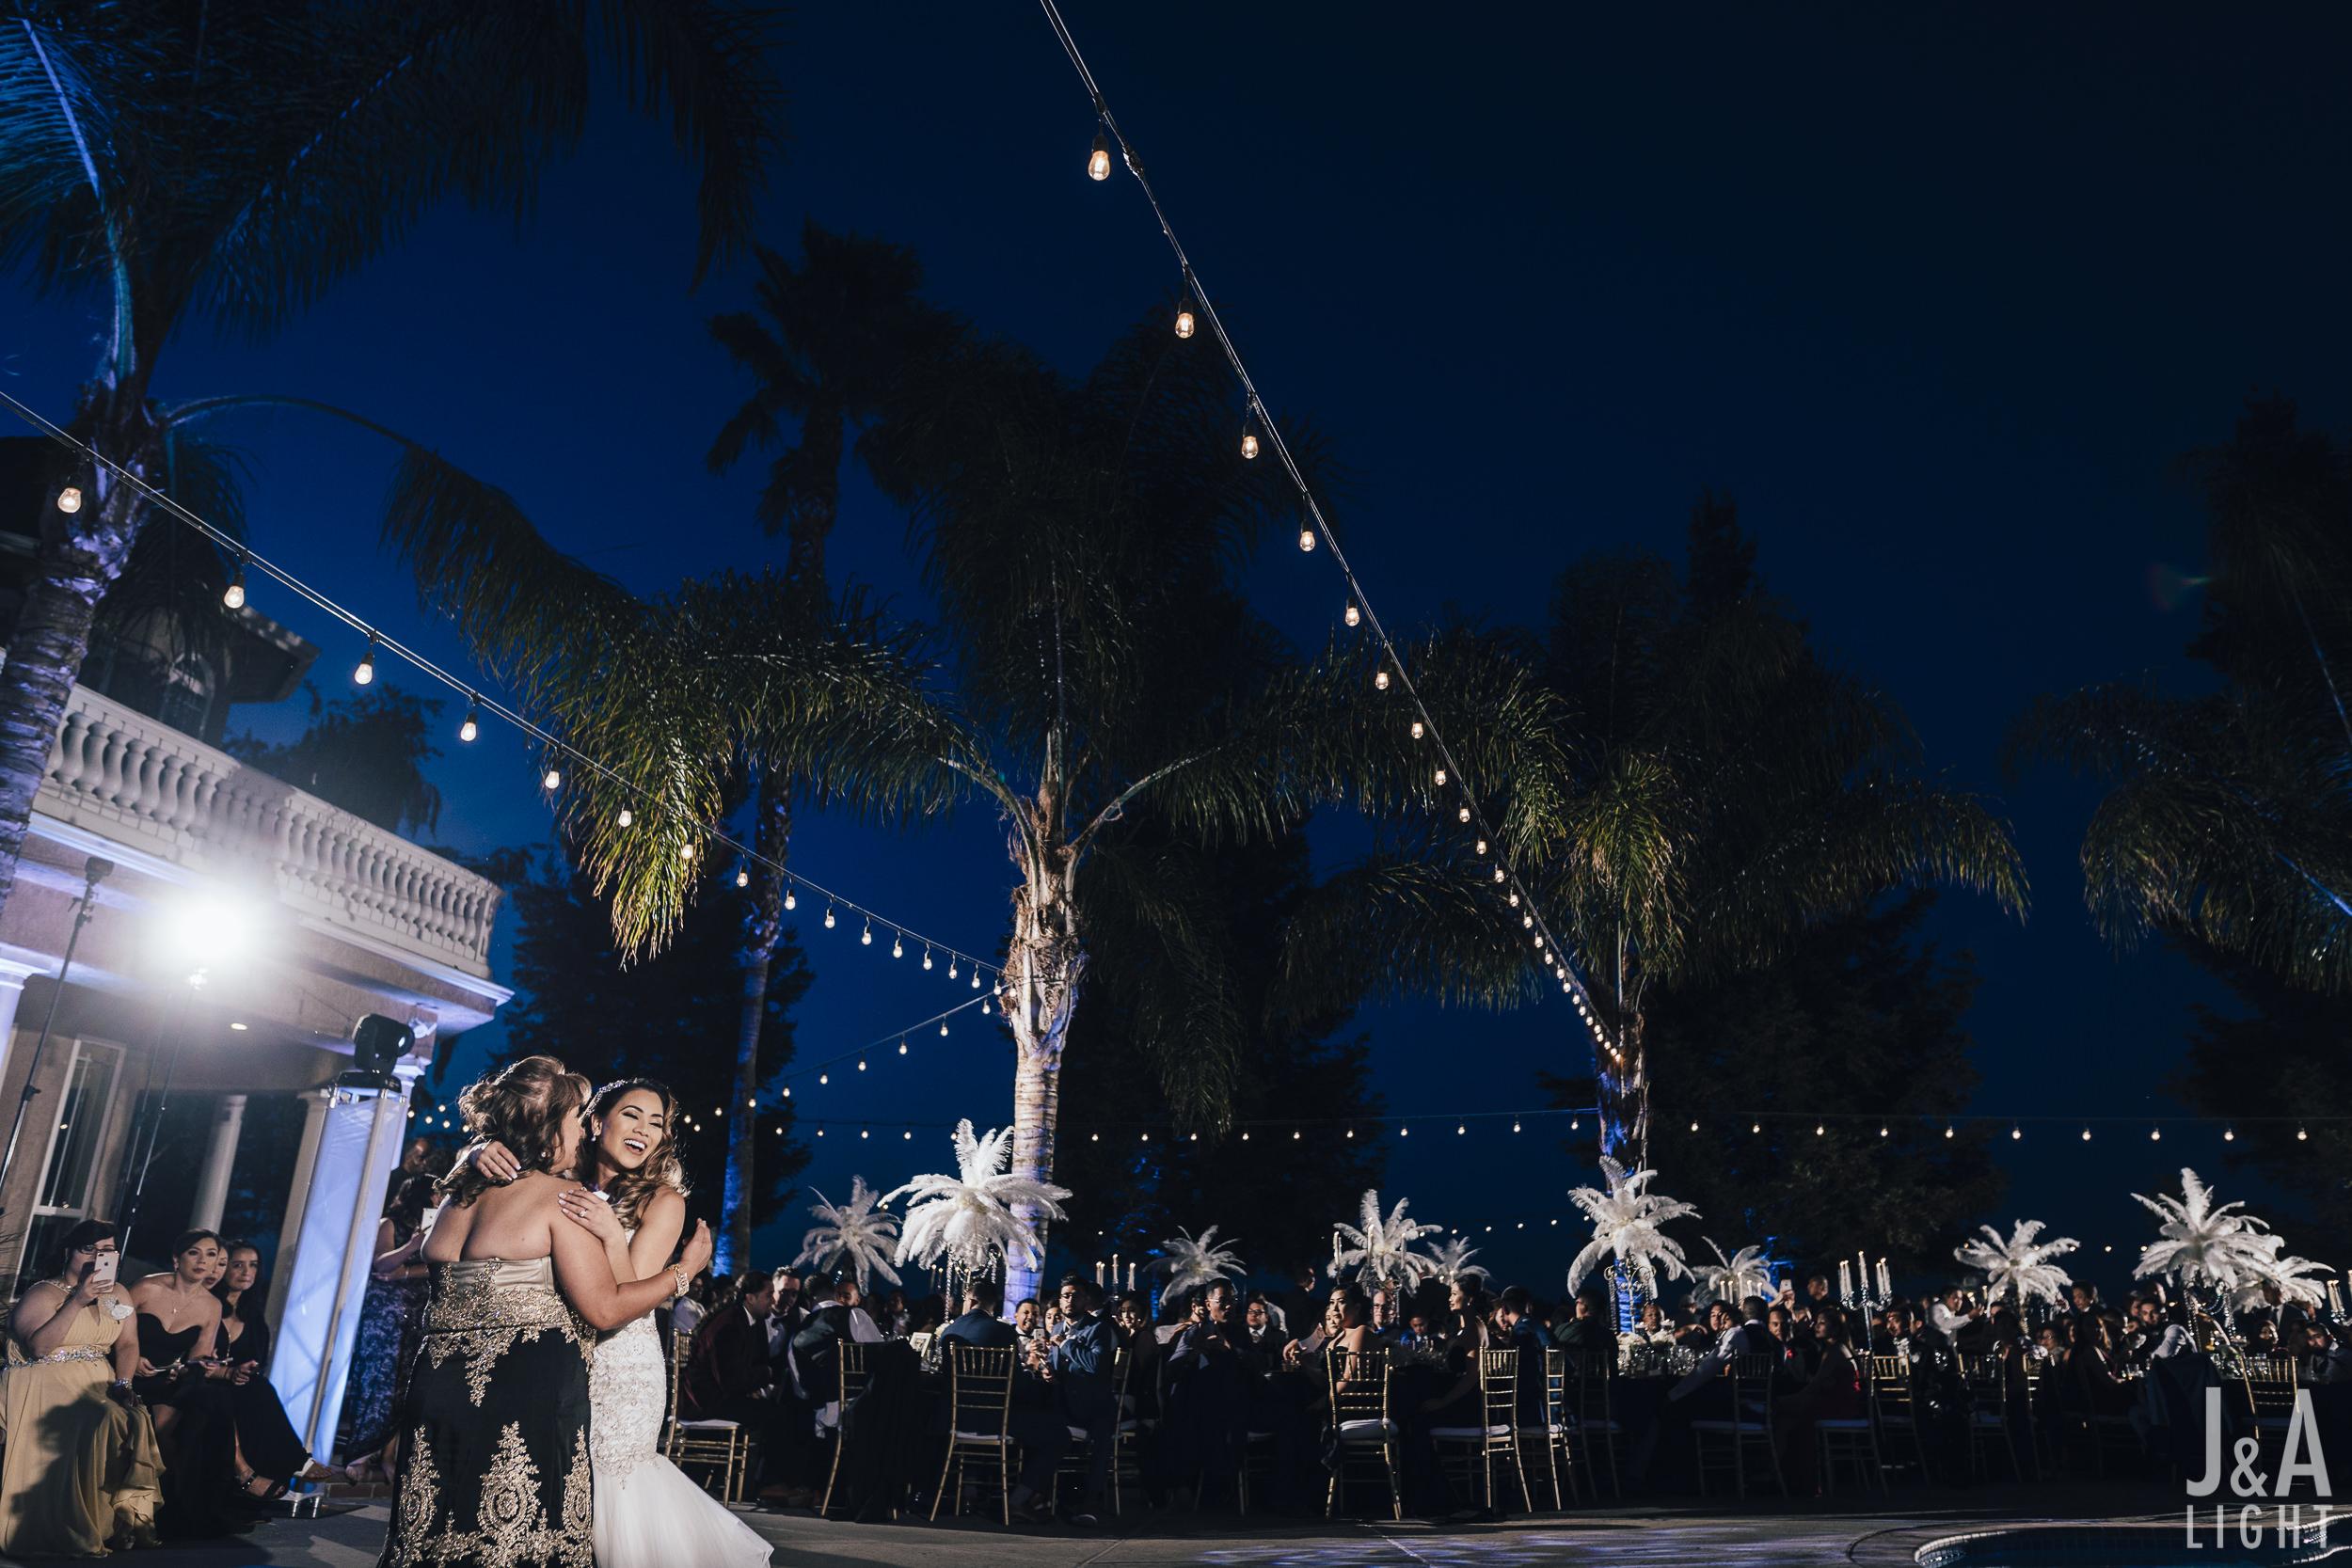 20171014-JanDan-LosBanos-GlassMansion-Wedding-Blog-068.jpg